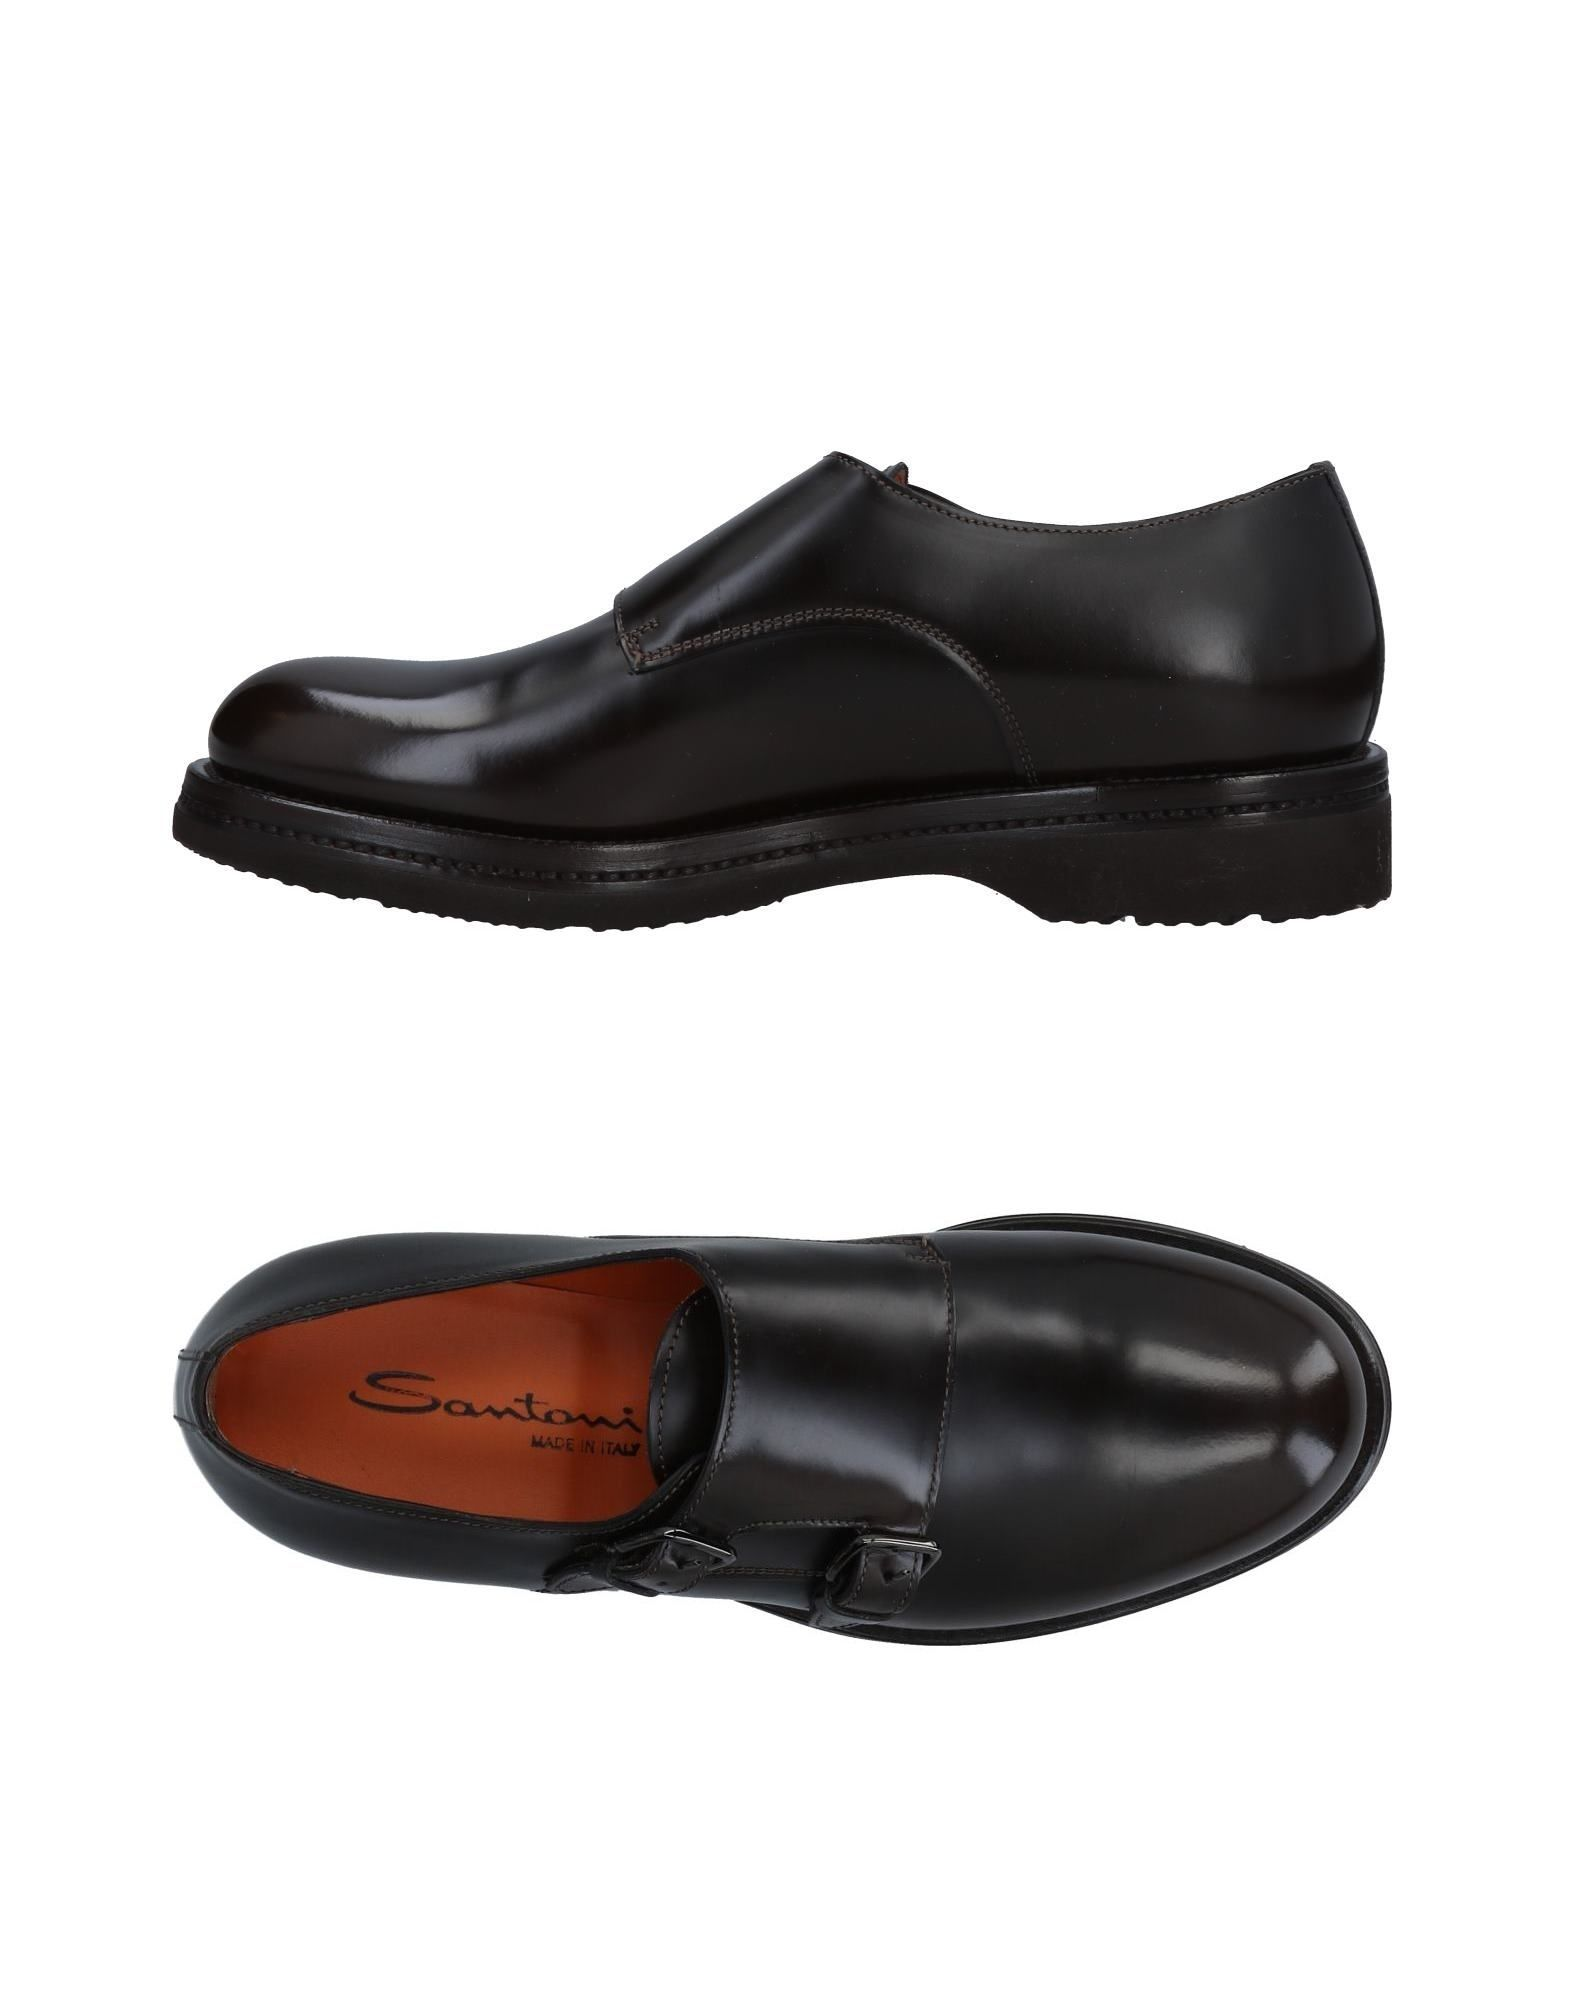 Santoni Mokassins Herren  11493025FC Gute Qualität beliebte Schuhe